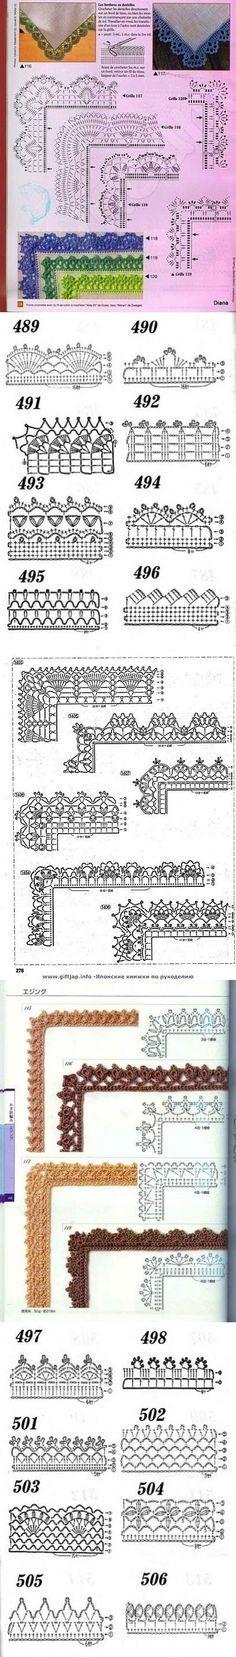 Mejores 1132 imágenes de paqui en Pinterest | Crochet edgings ...